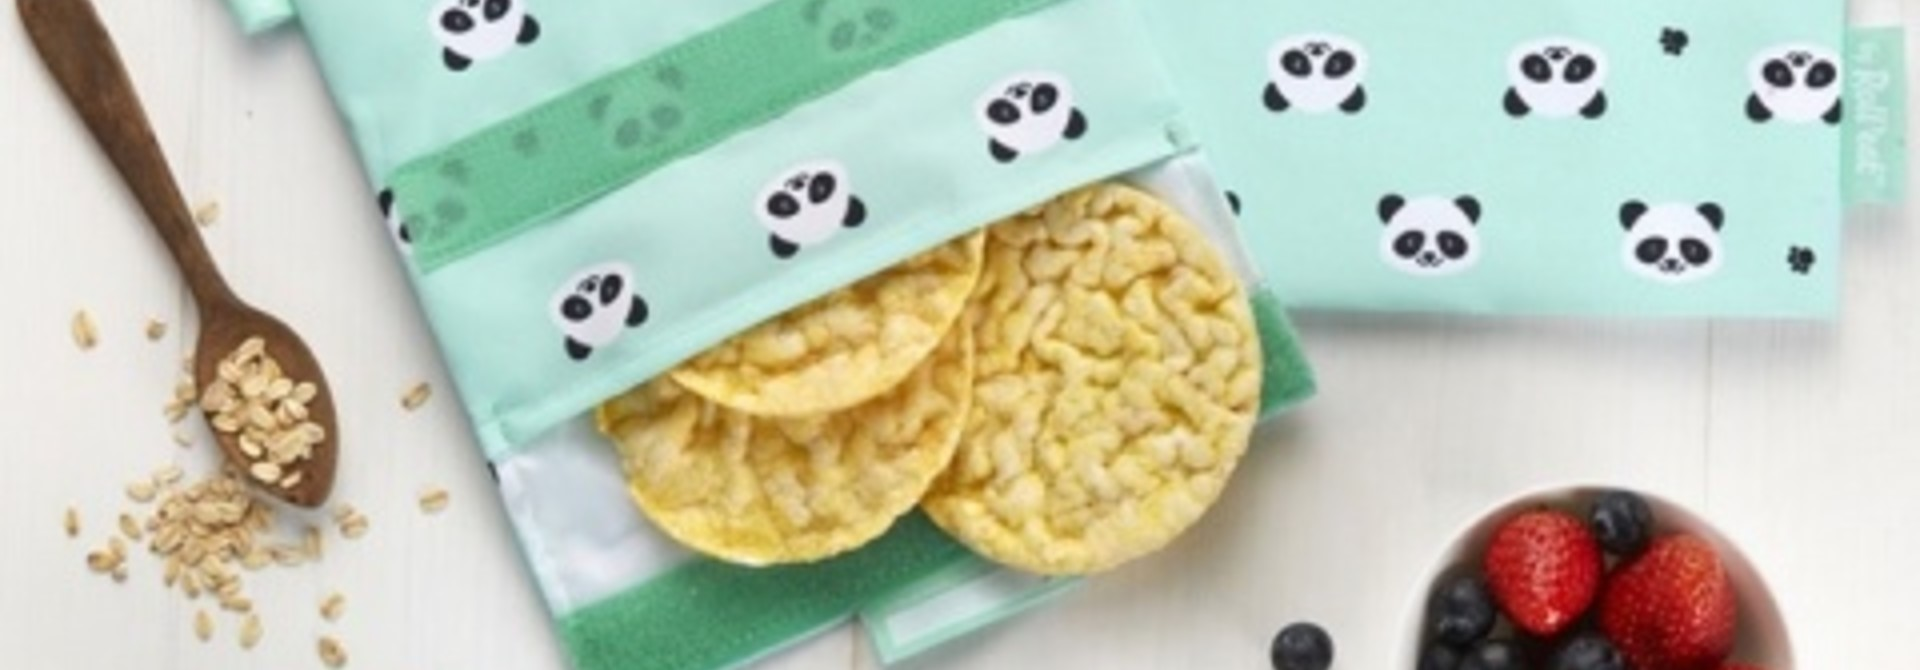 Snack'n'Go lunchzakje - Animals